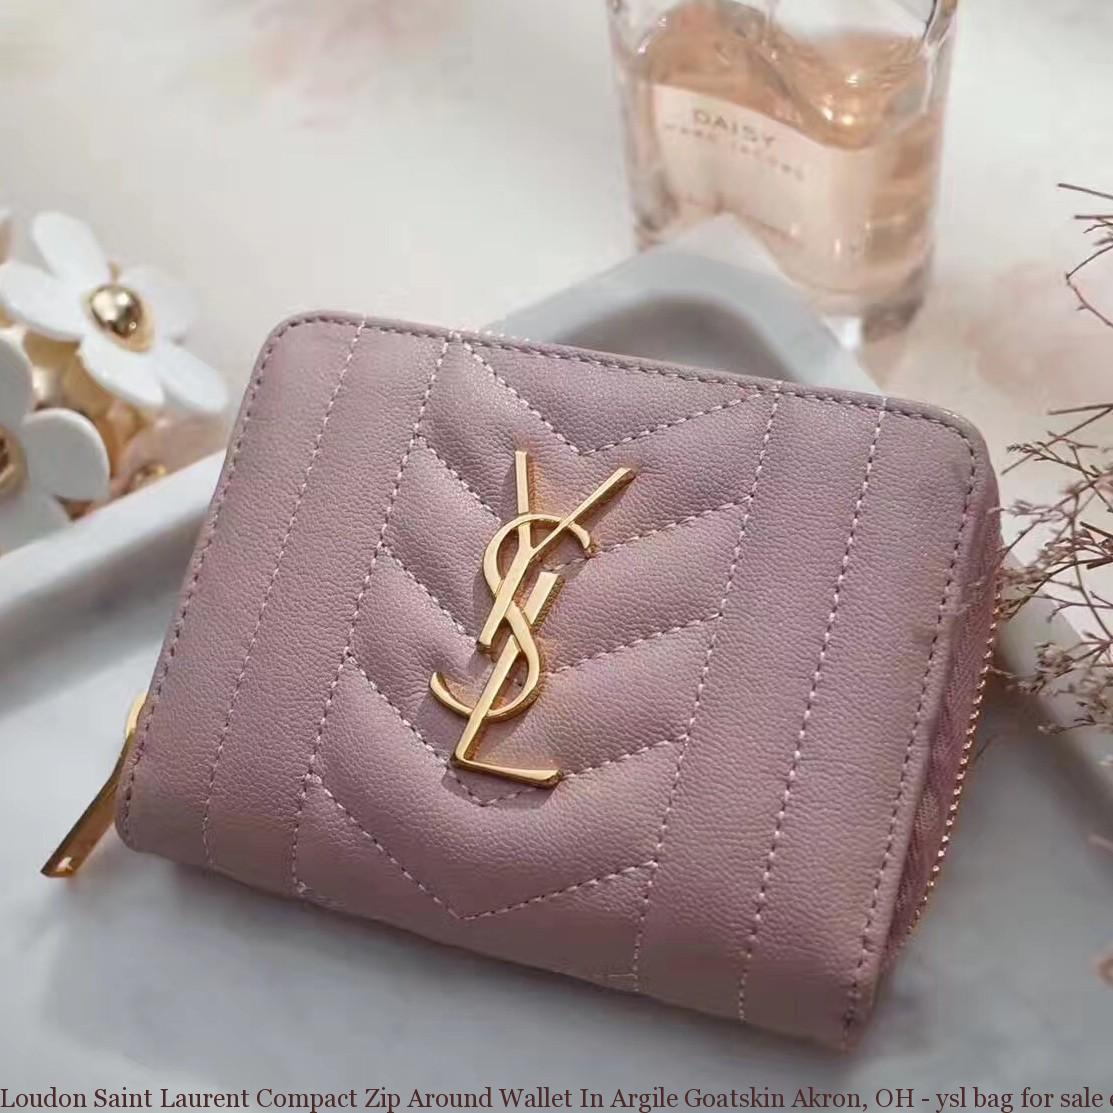 Loudon Saint Laurent Compact Zip Around Wallet In Argile Goatskin ... f76382f72eab7